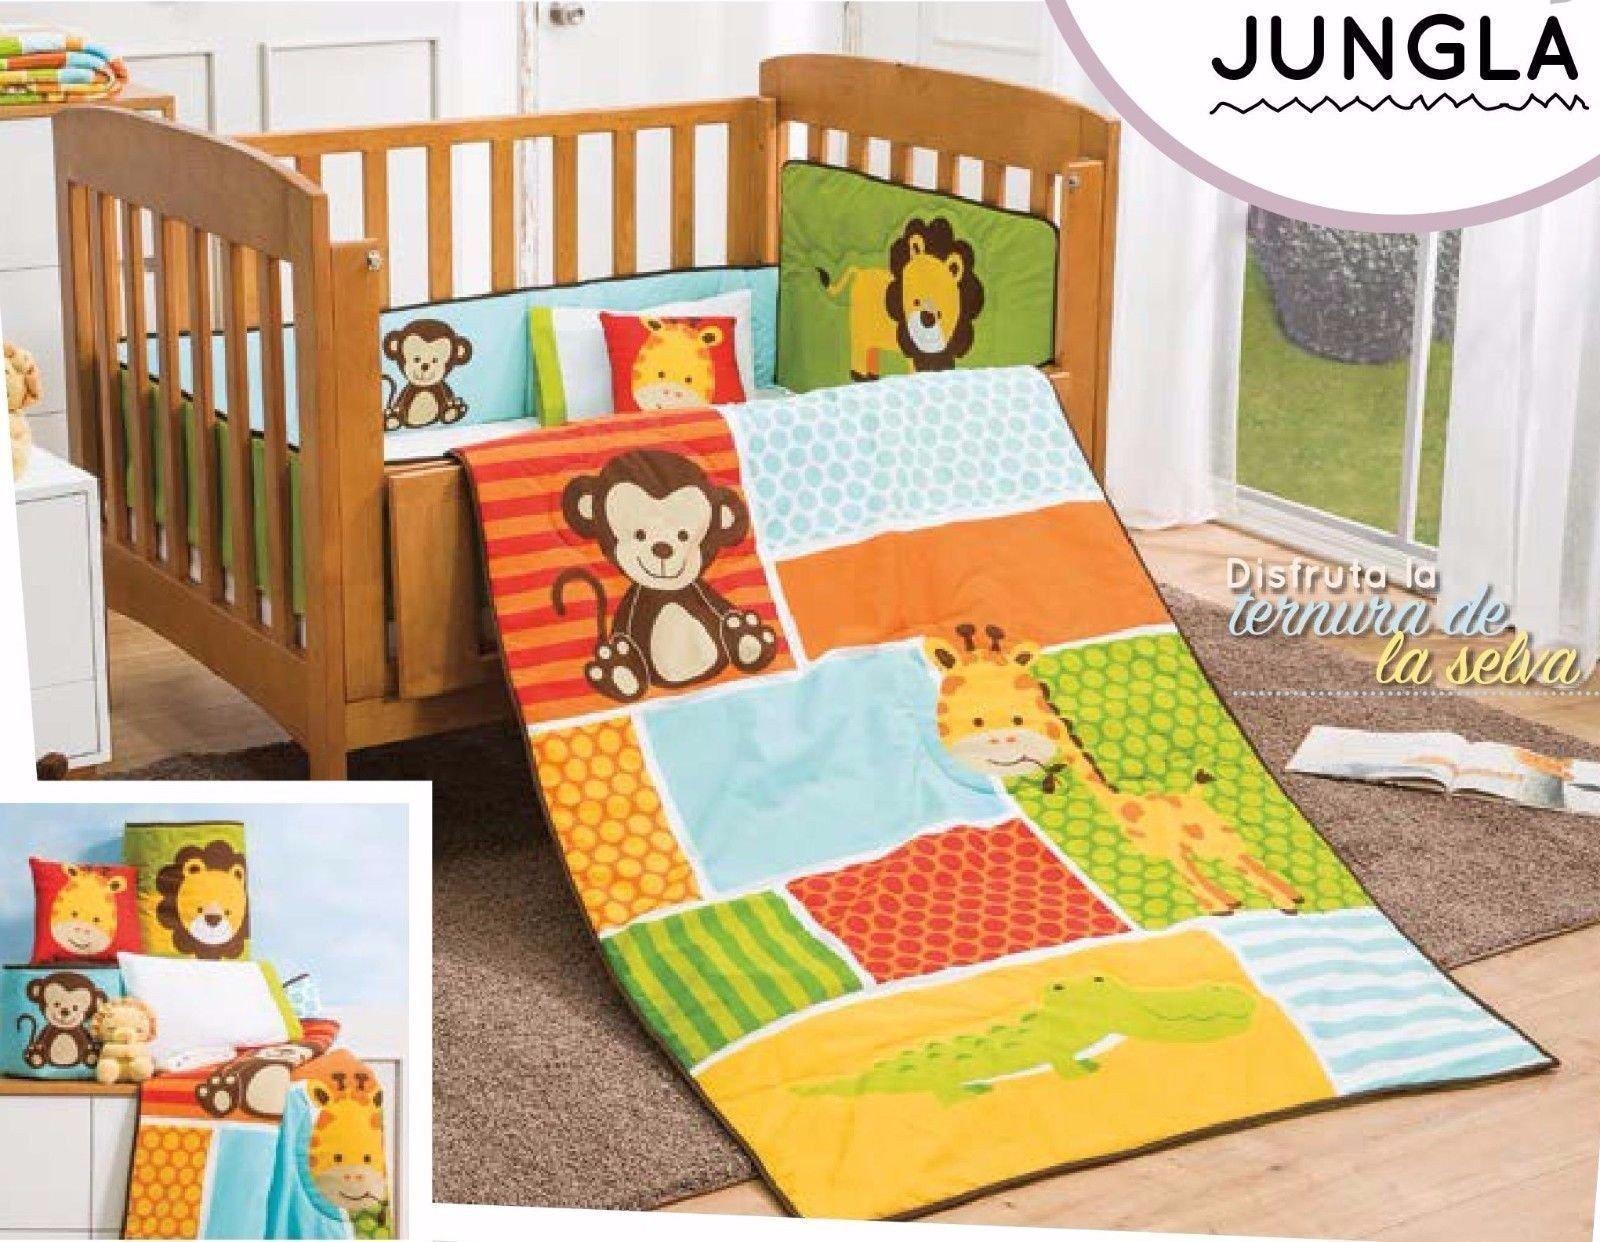 Baby Boy Bedroom Set Luxury 6 Piece Baby Boy Nursery Crib Bedding Set Jungle Multi